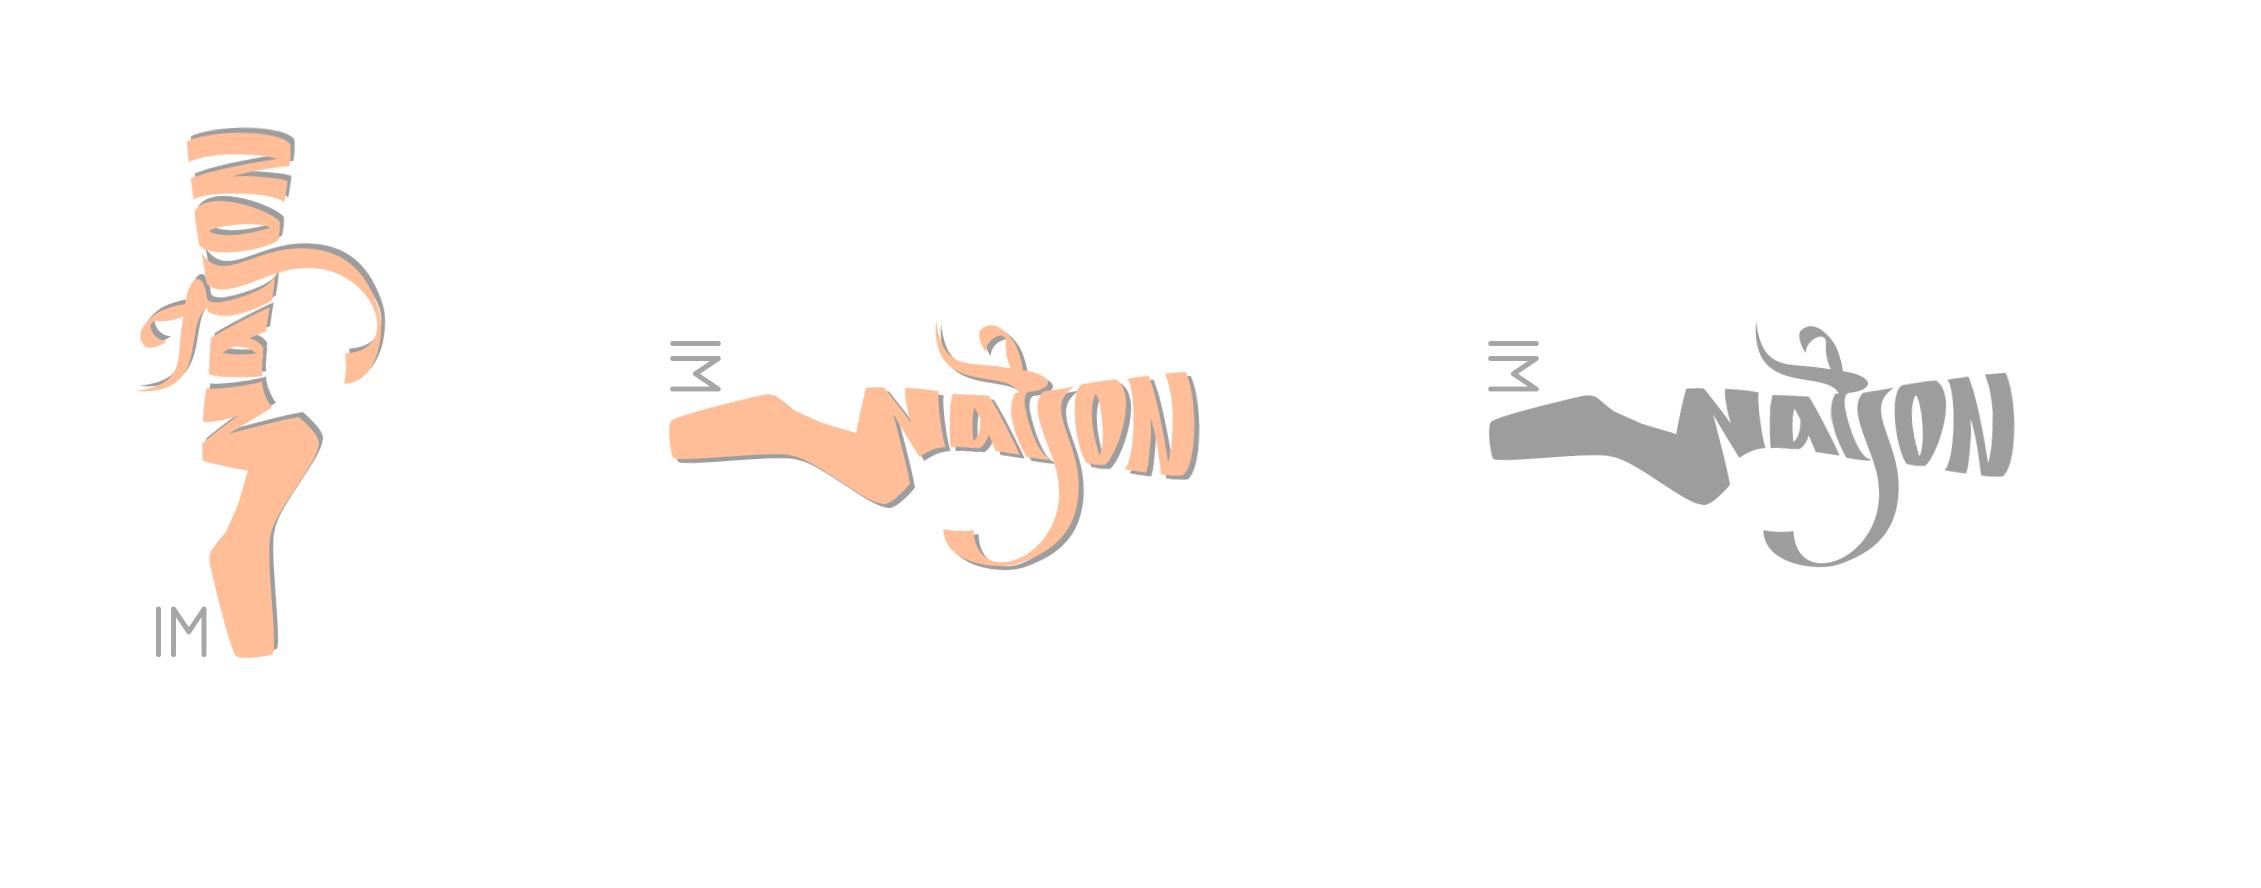 Разработать логотип для балетного бренда фото f_9085bbe08e12d07f.jpg